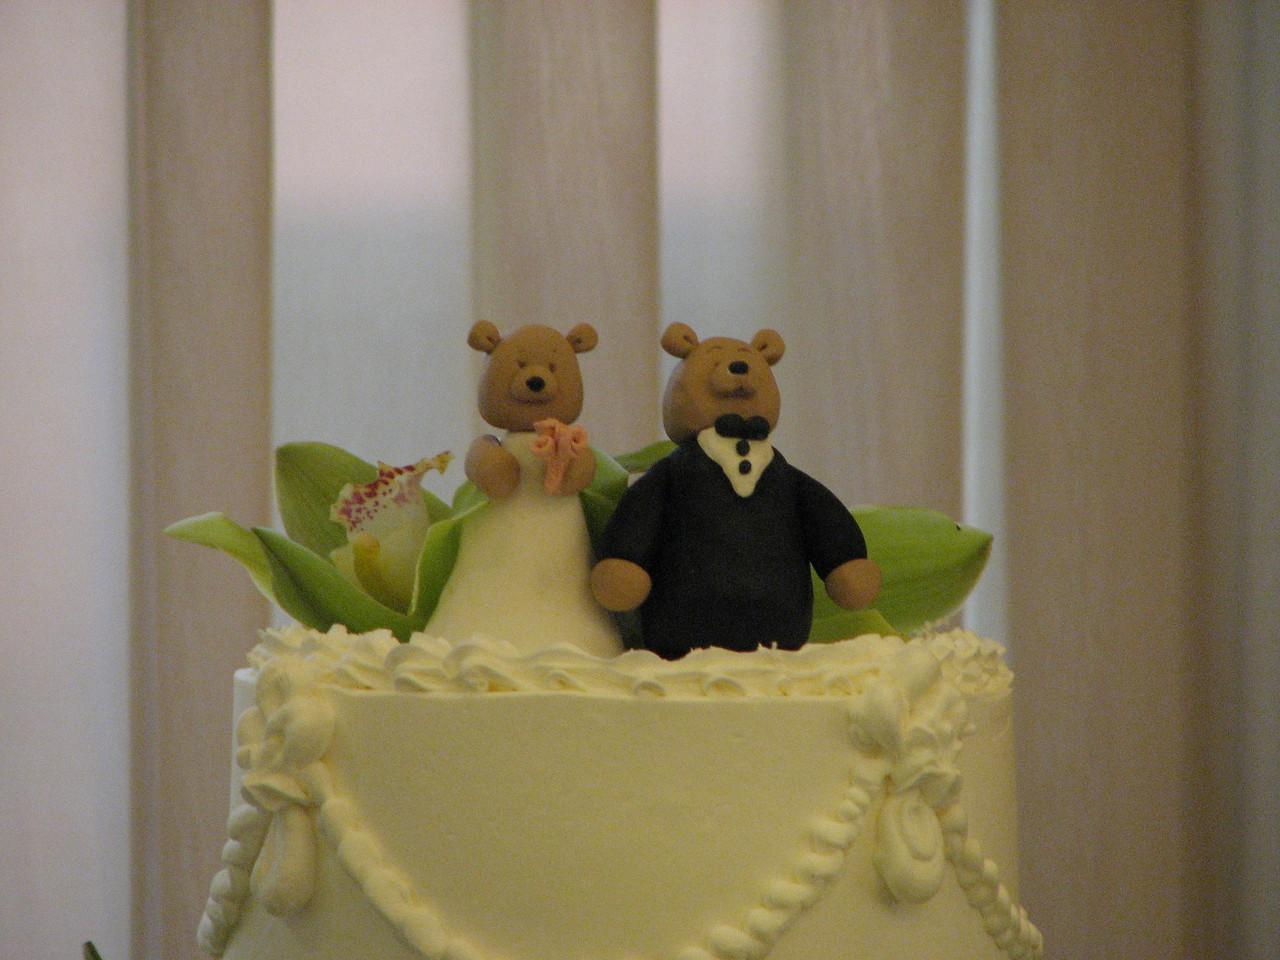 2007 06 09 Sat - Wedding cake topper 1